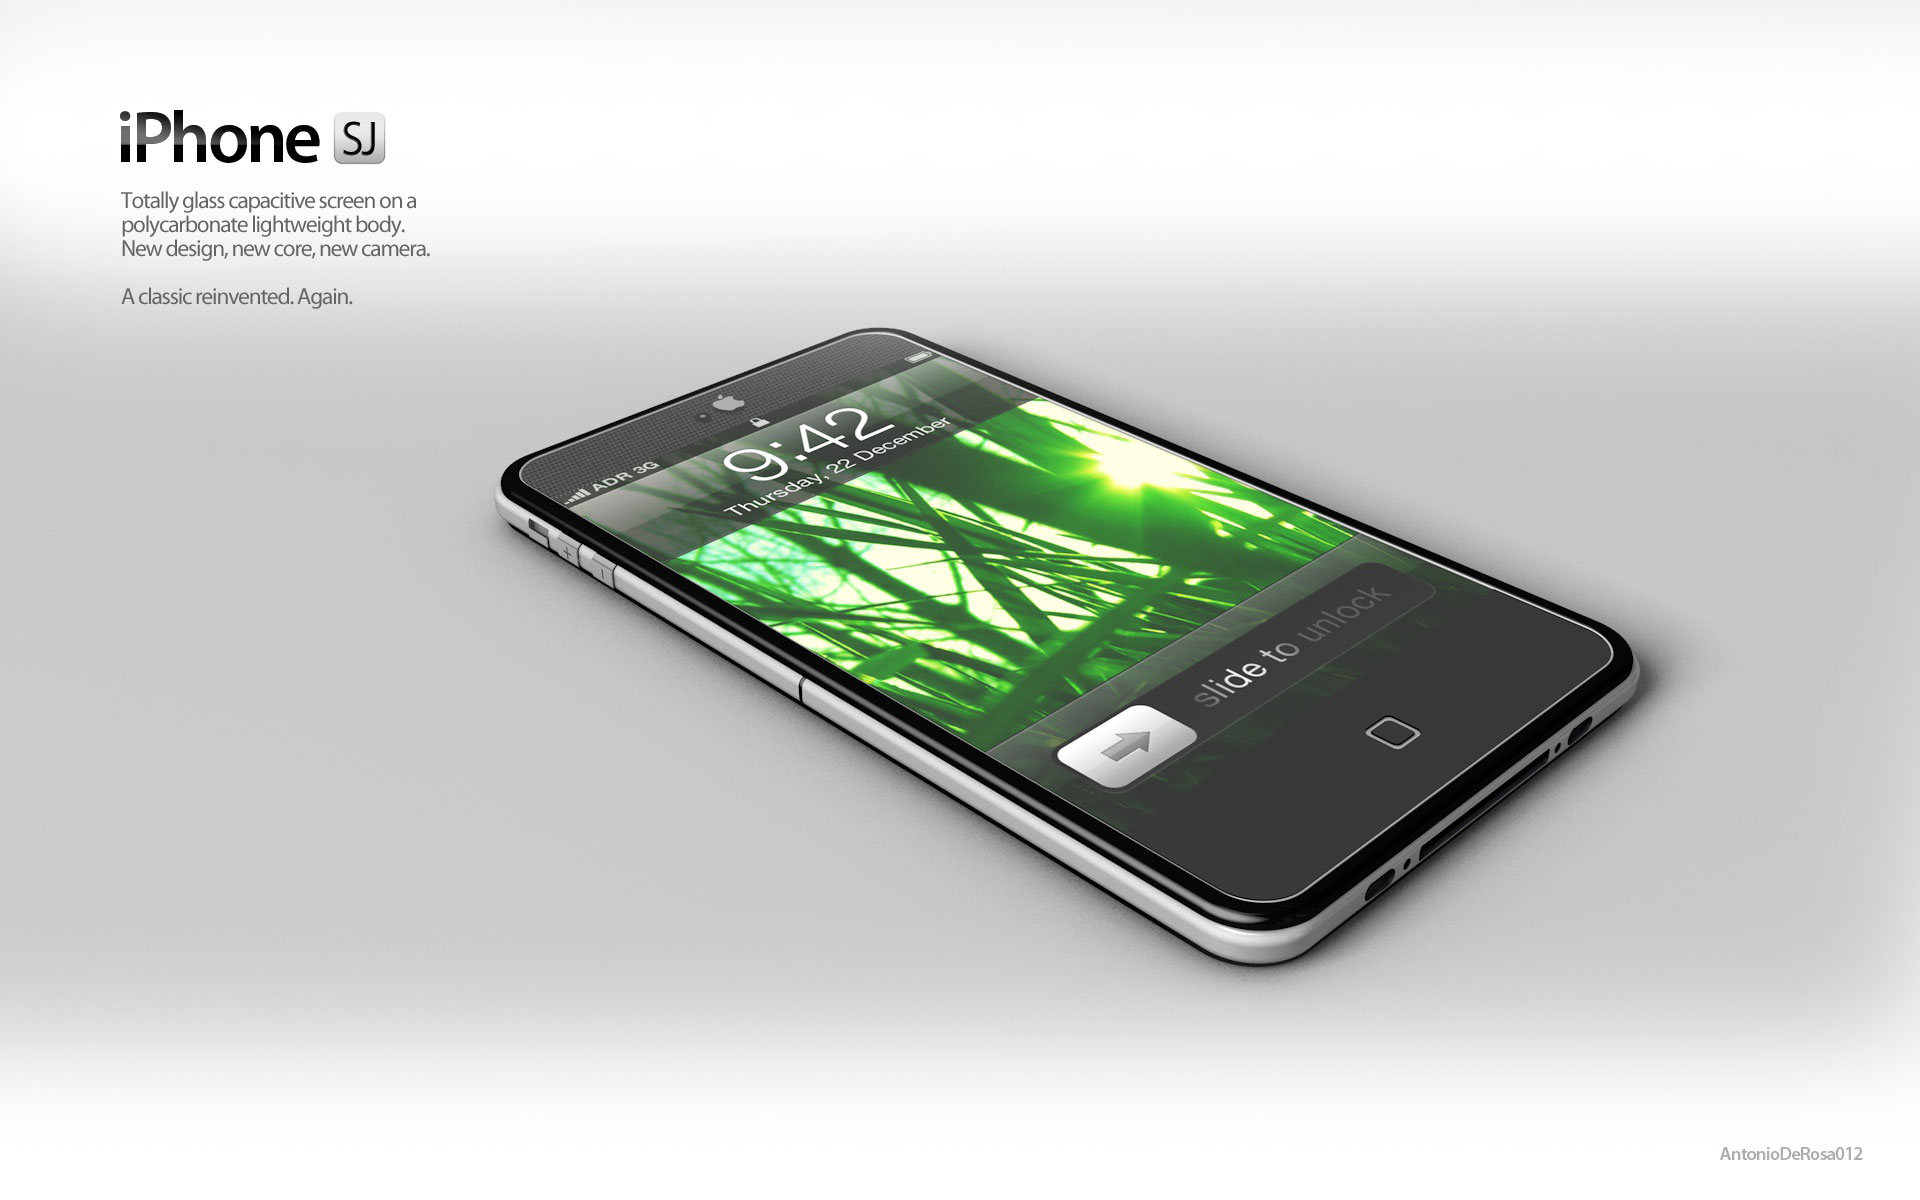 Iphone 5 Design Hd Online 1080x960px Wide Screen Desktop Wallpaper 1920x1200